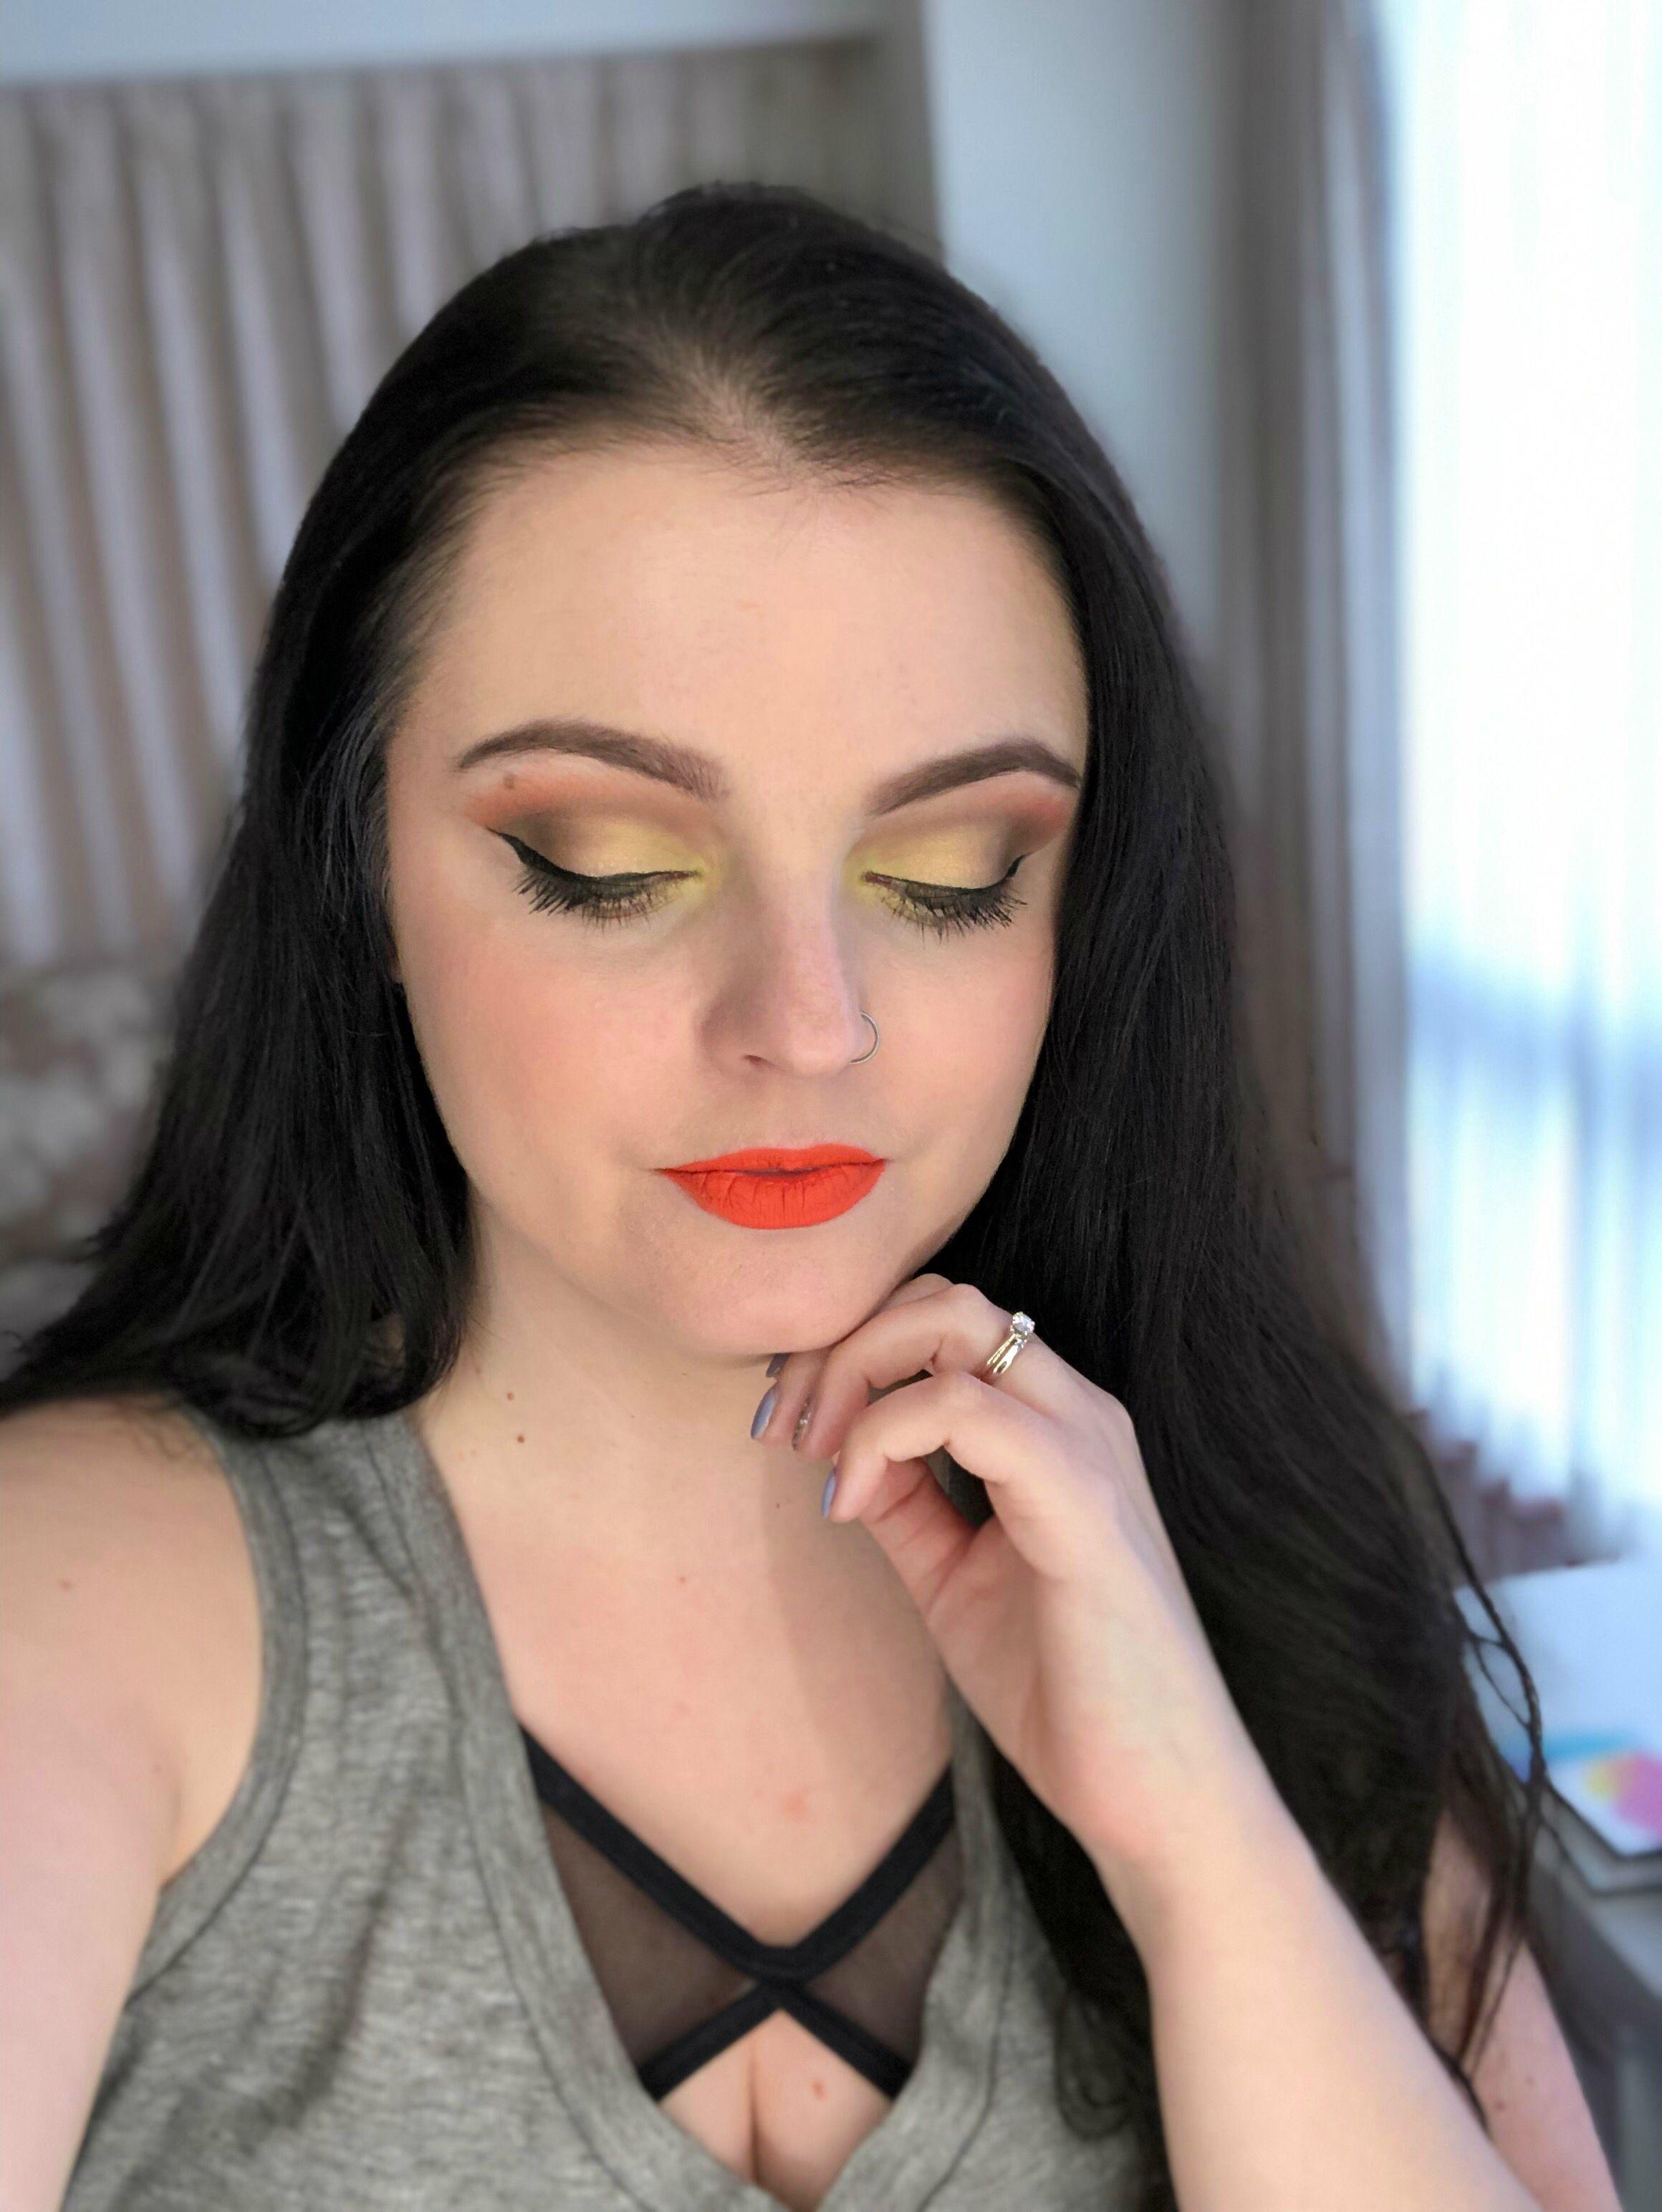 LimeLife Perfect Eyeshadow and Jeffree Star Makeup, Eye